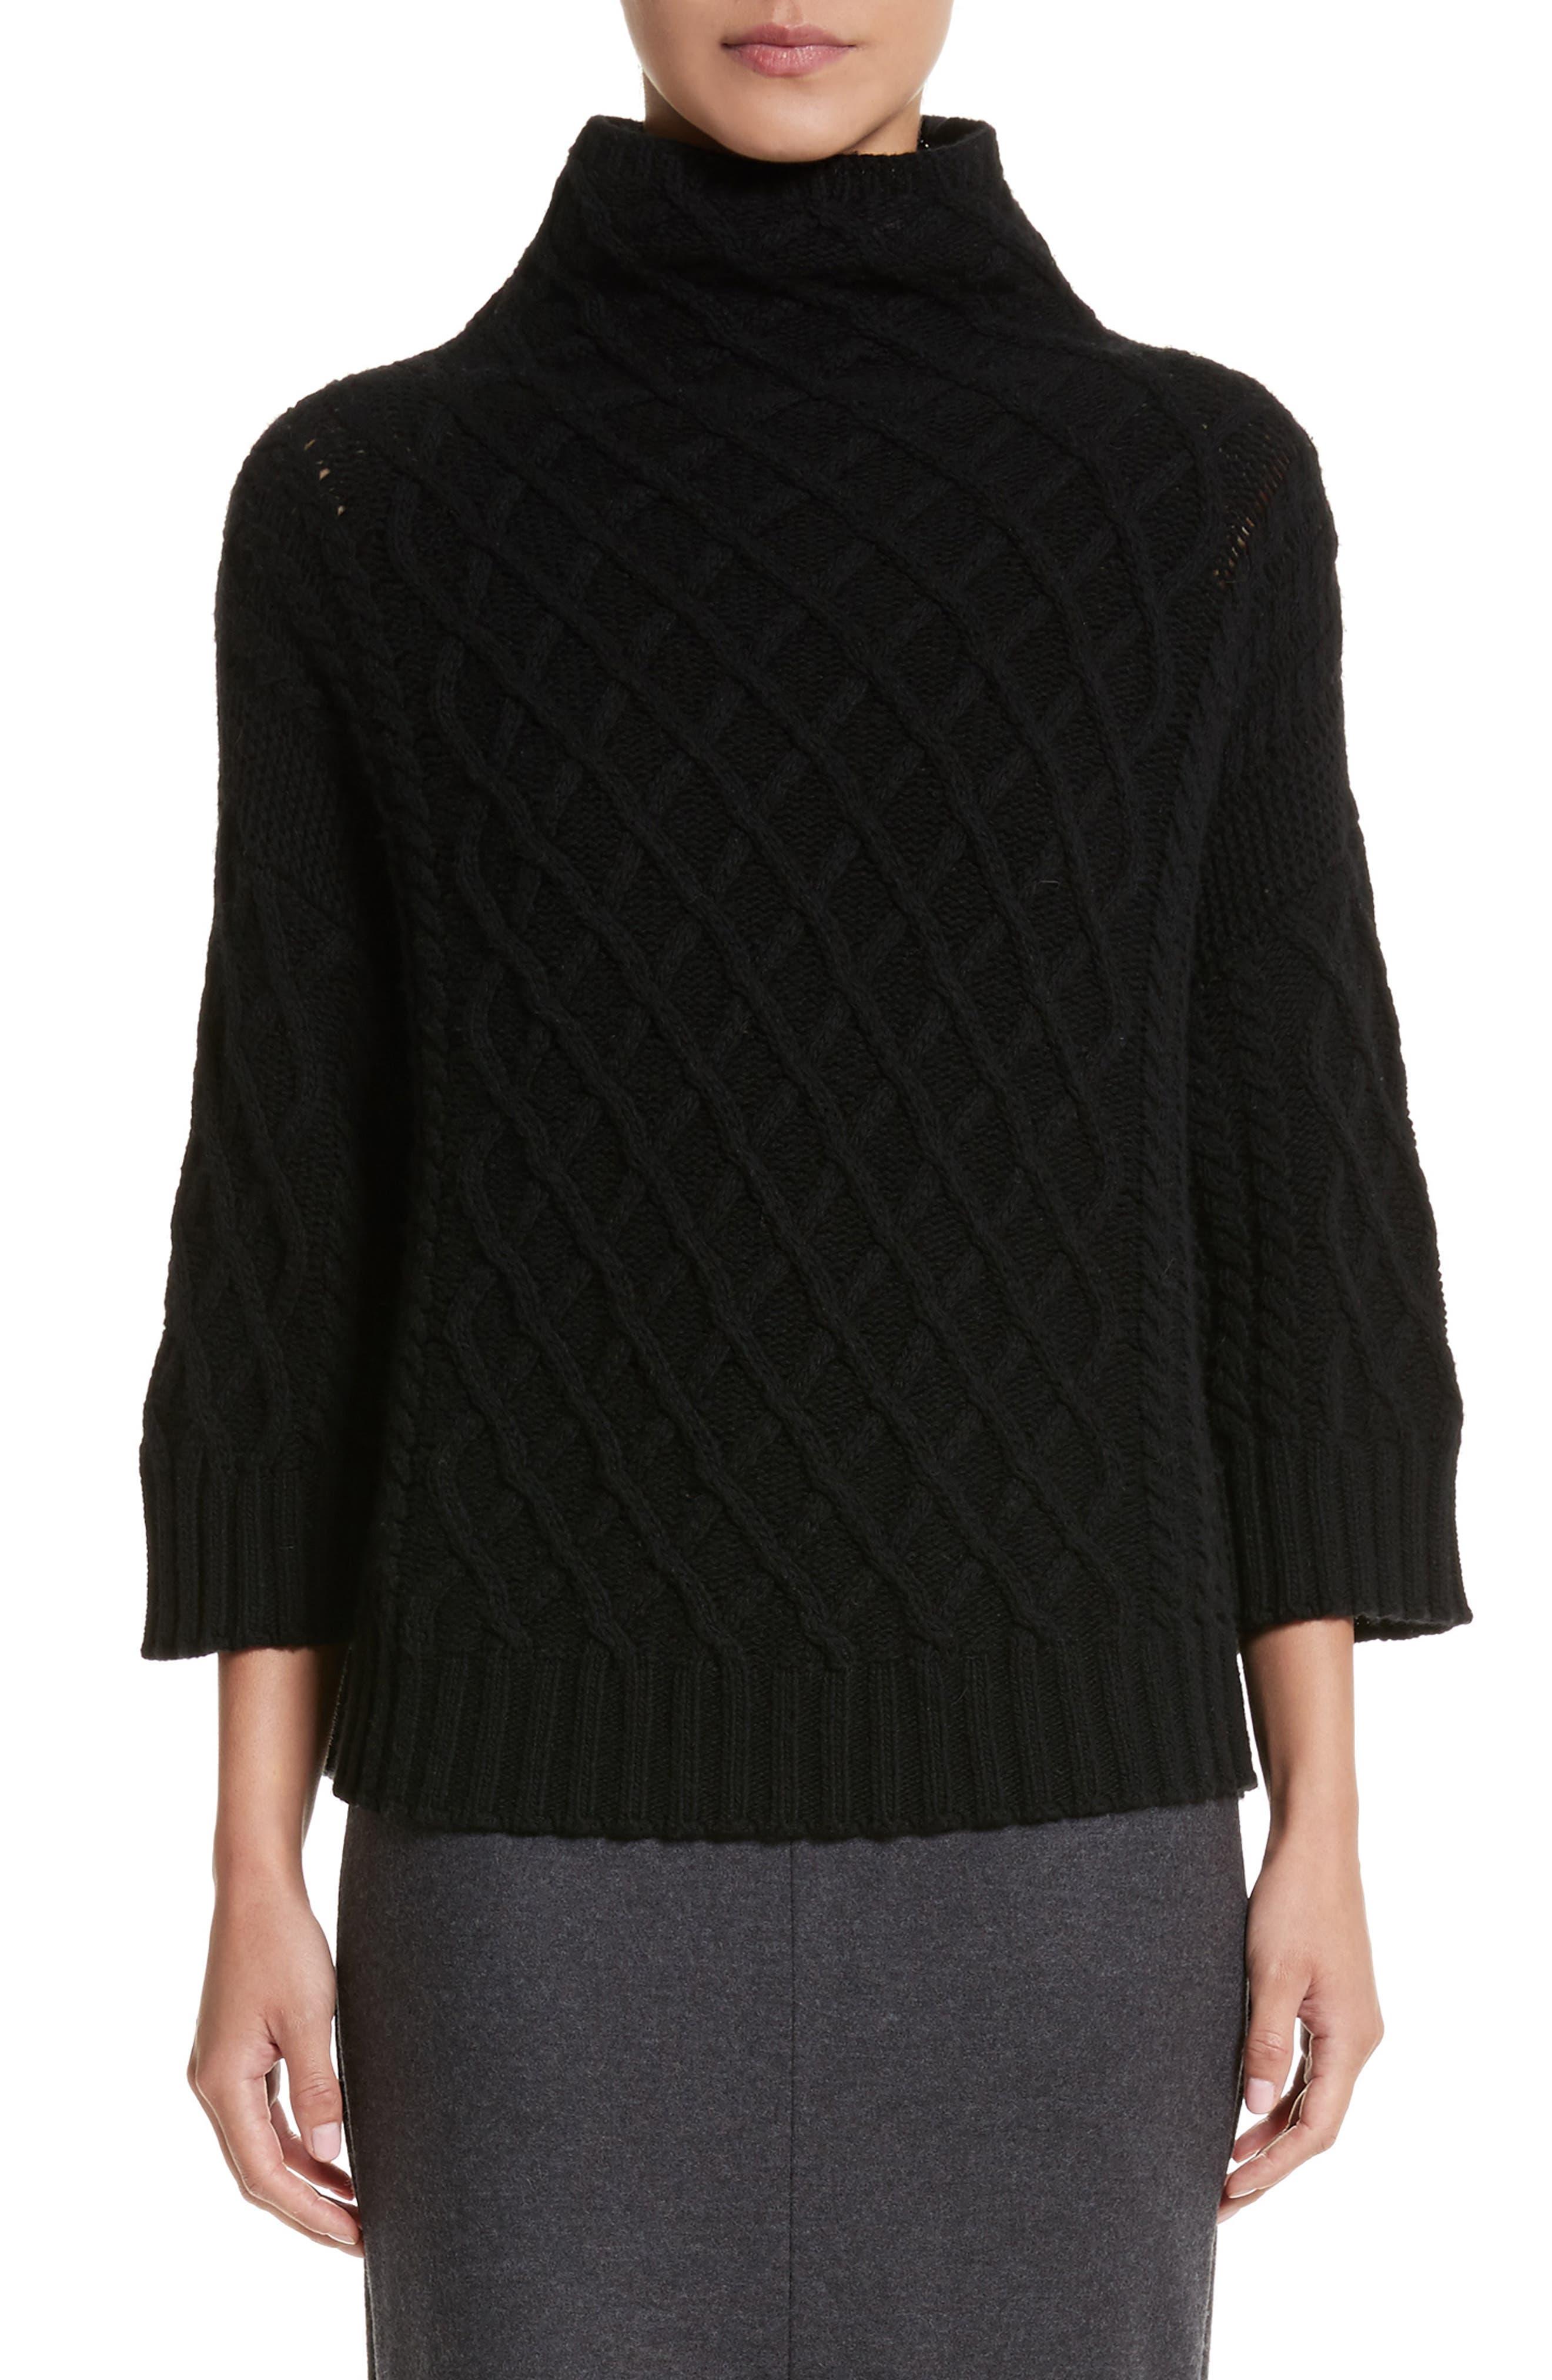 Main Image - Max Mara Cantone Wool & Cashmere Funnel Neck Sweater